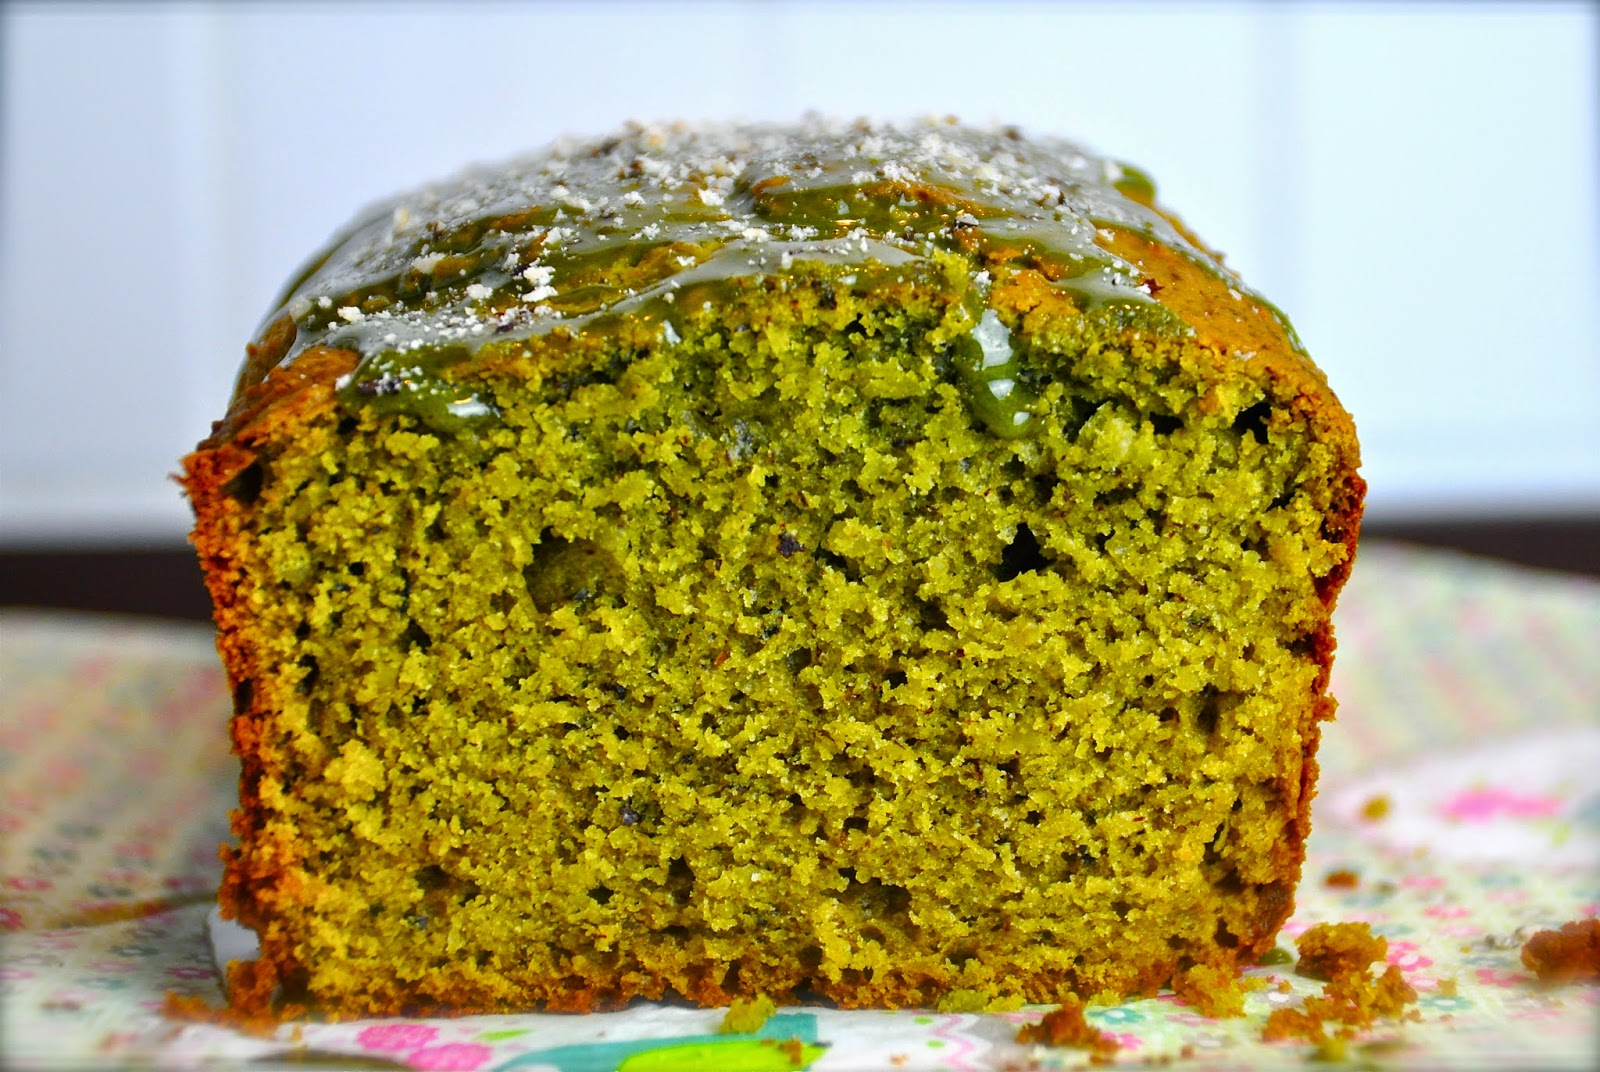 In Matcha Cake